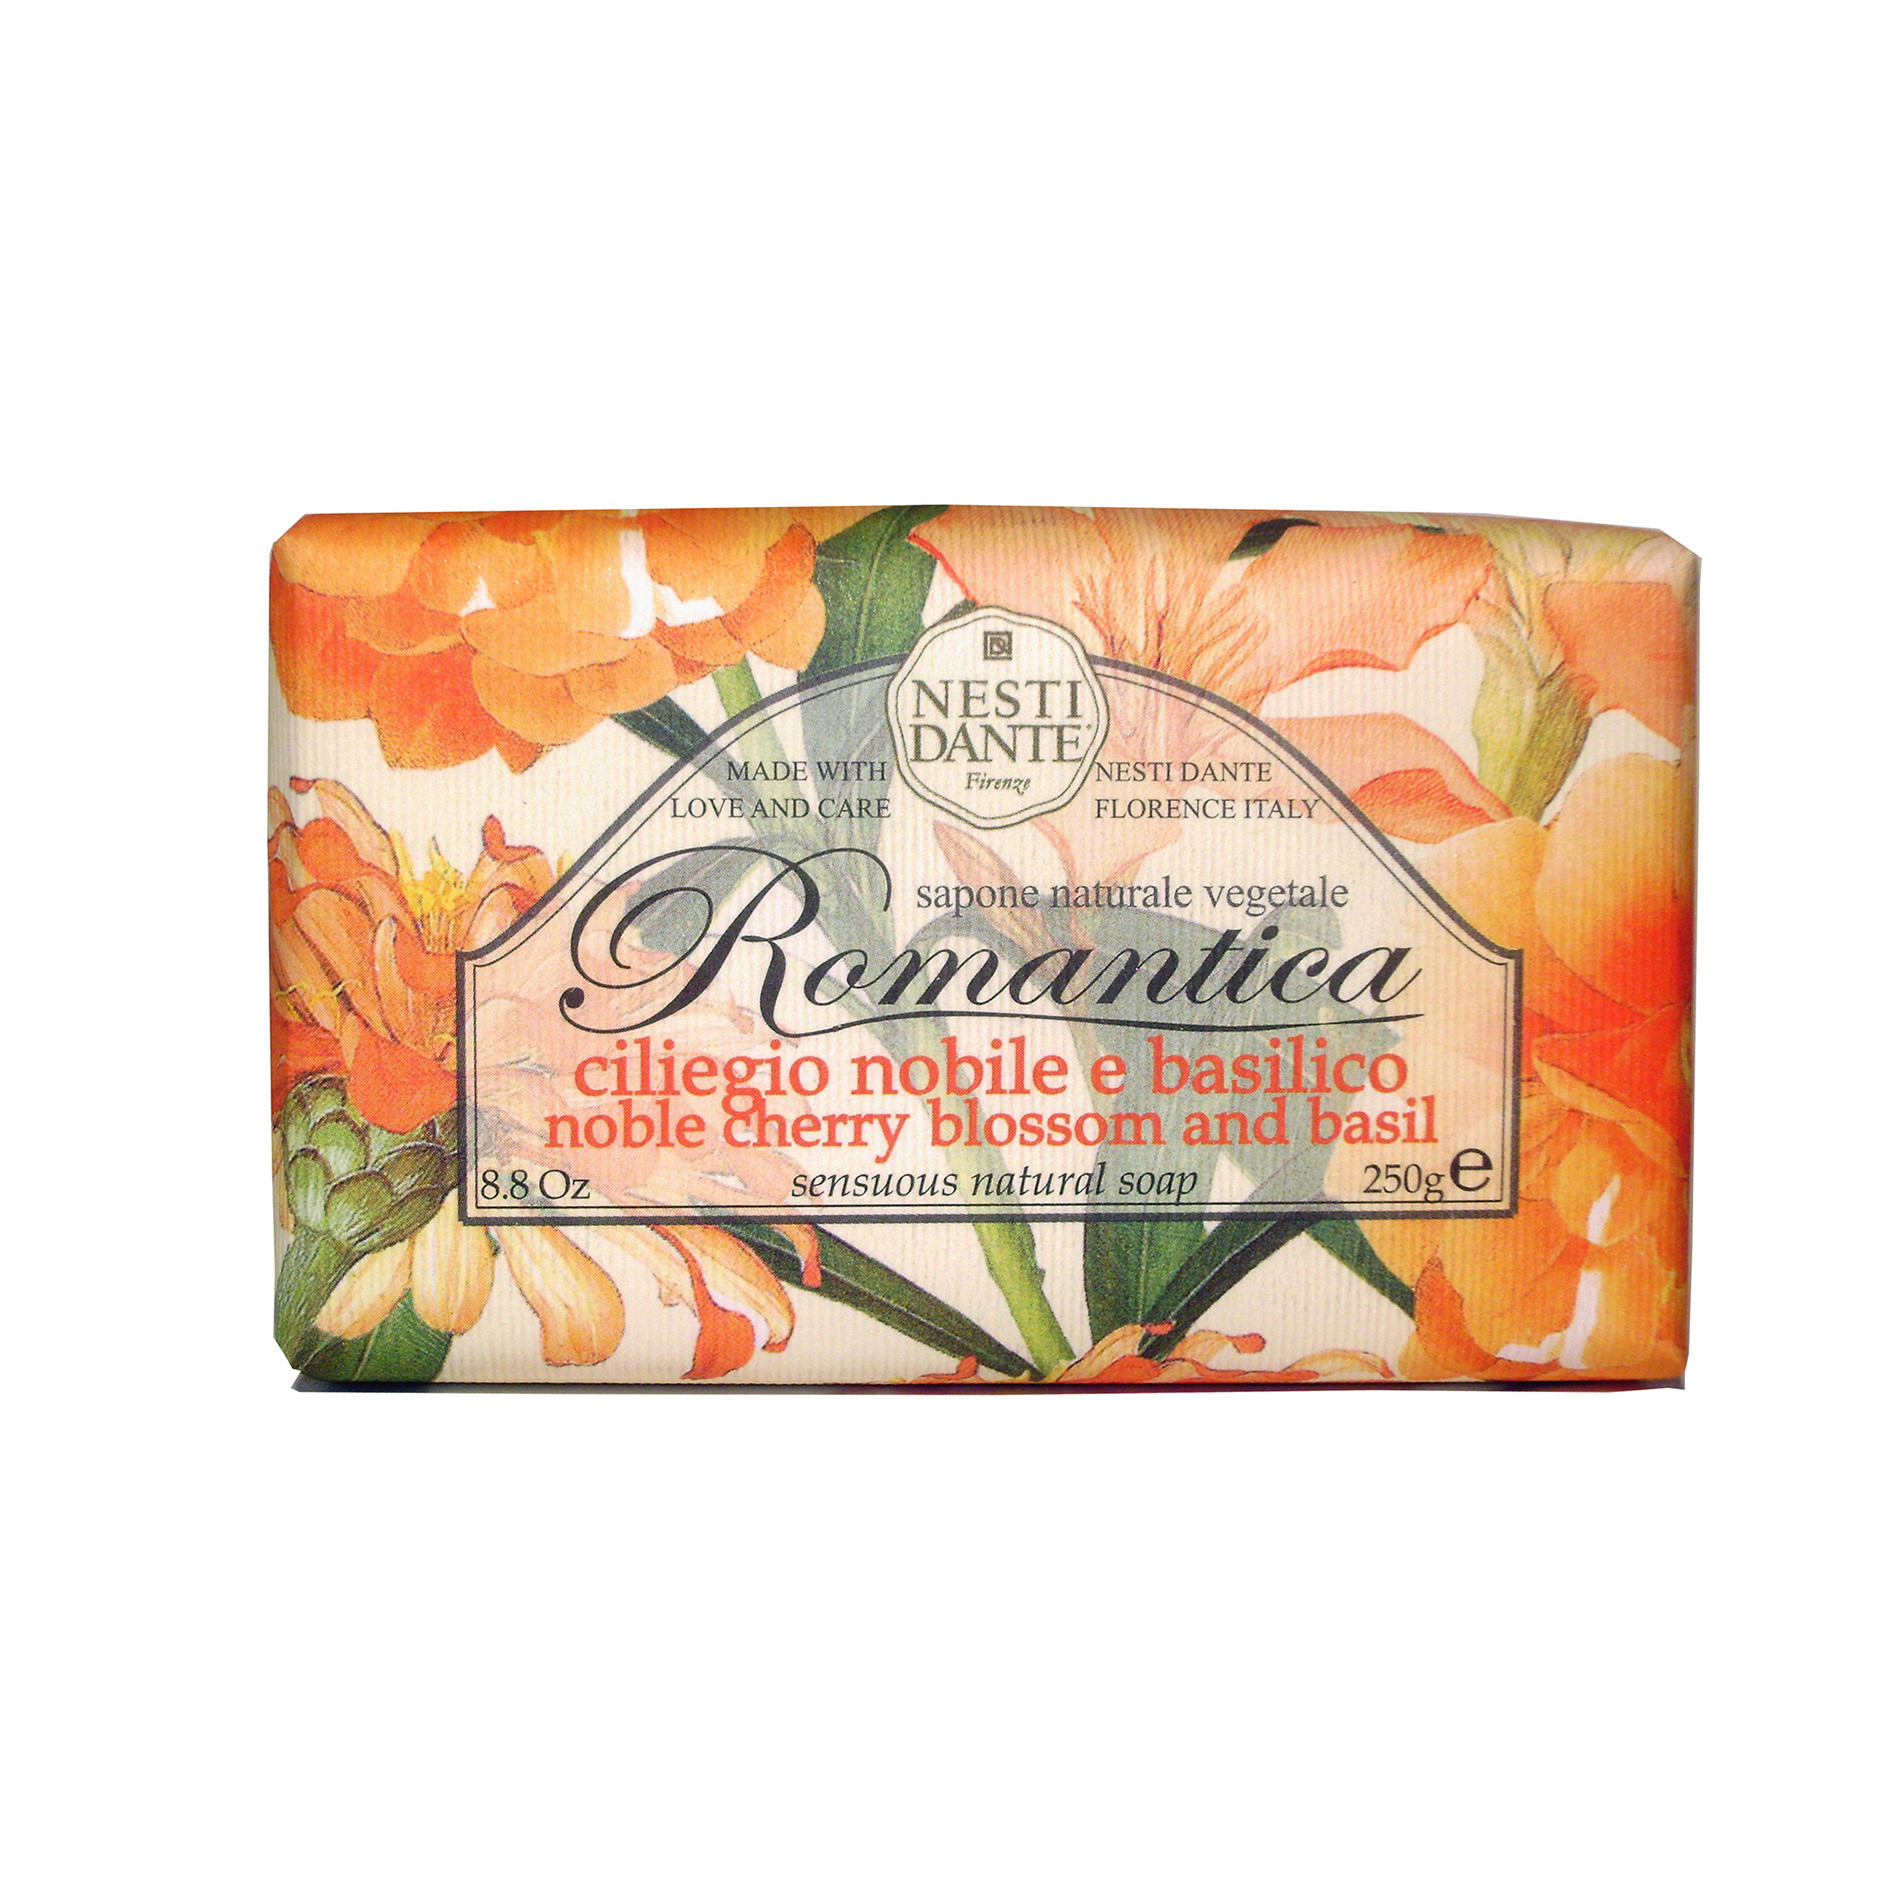 Romantica - Ciliegio Nobile E Basilico, Arancione, large image number 0